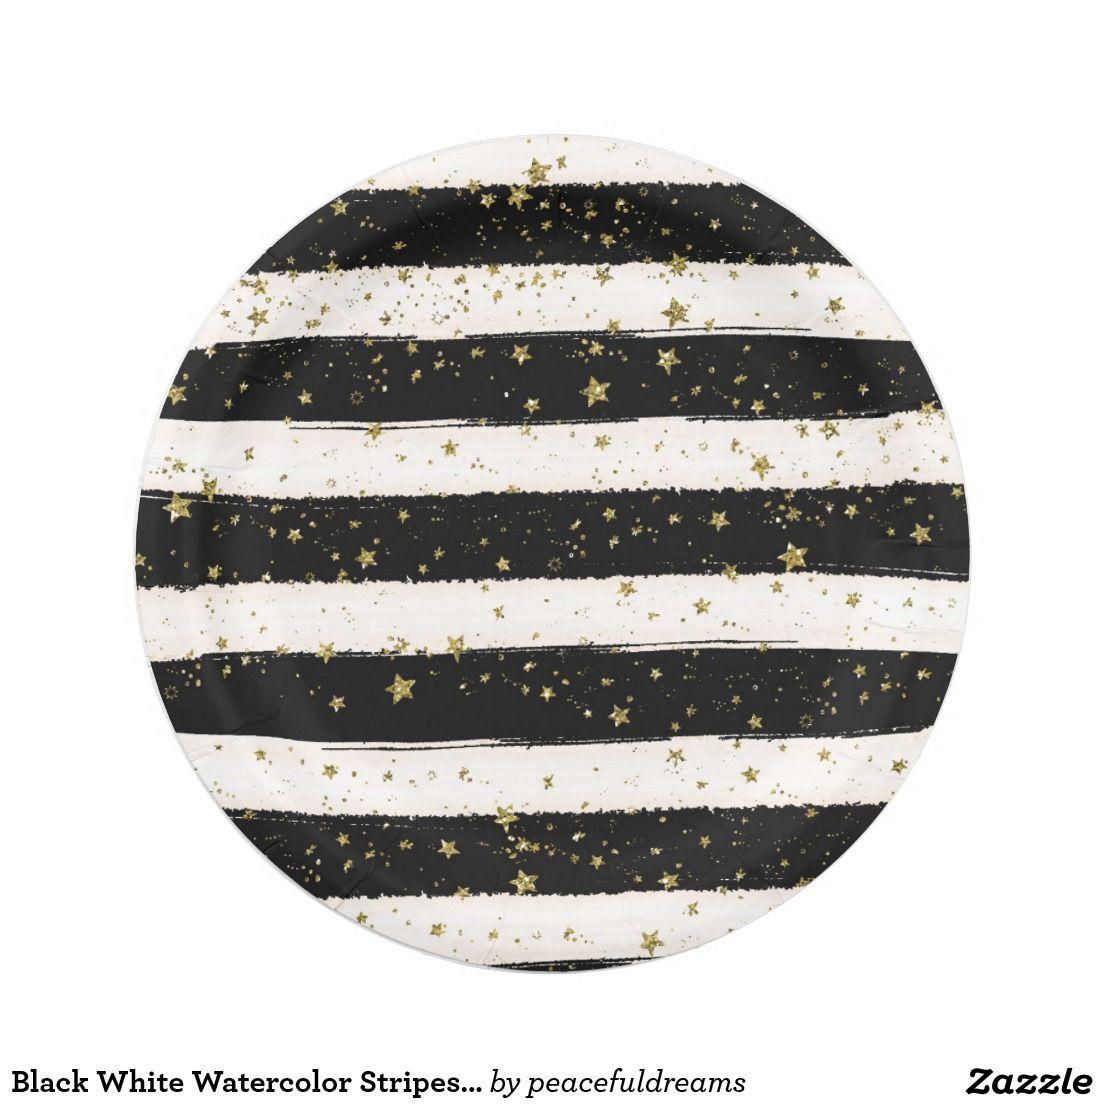 Black White Watercolor Stripes Gold Glitter Stars 7 Inch Paper Plate  sc 1 st  Pinterest & Black White Watercolor Stripes Gold Glitter Stars Paper Plate ...